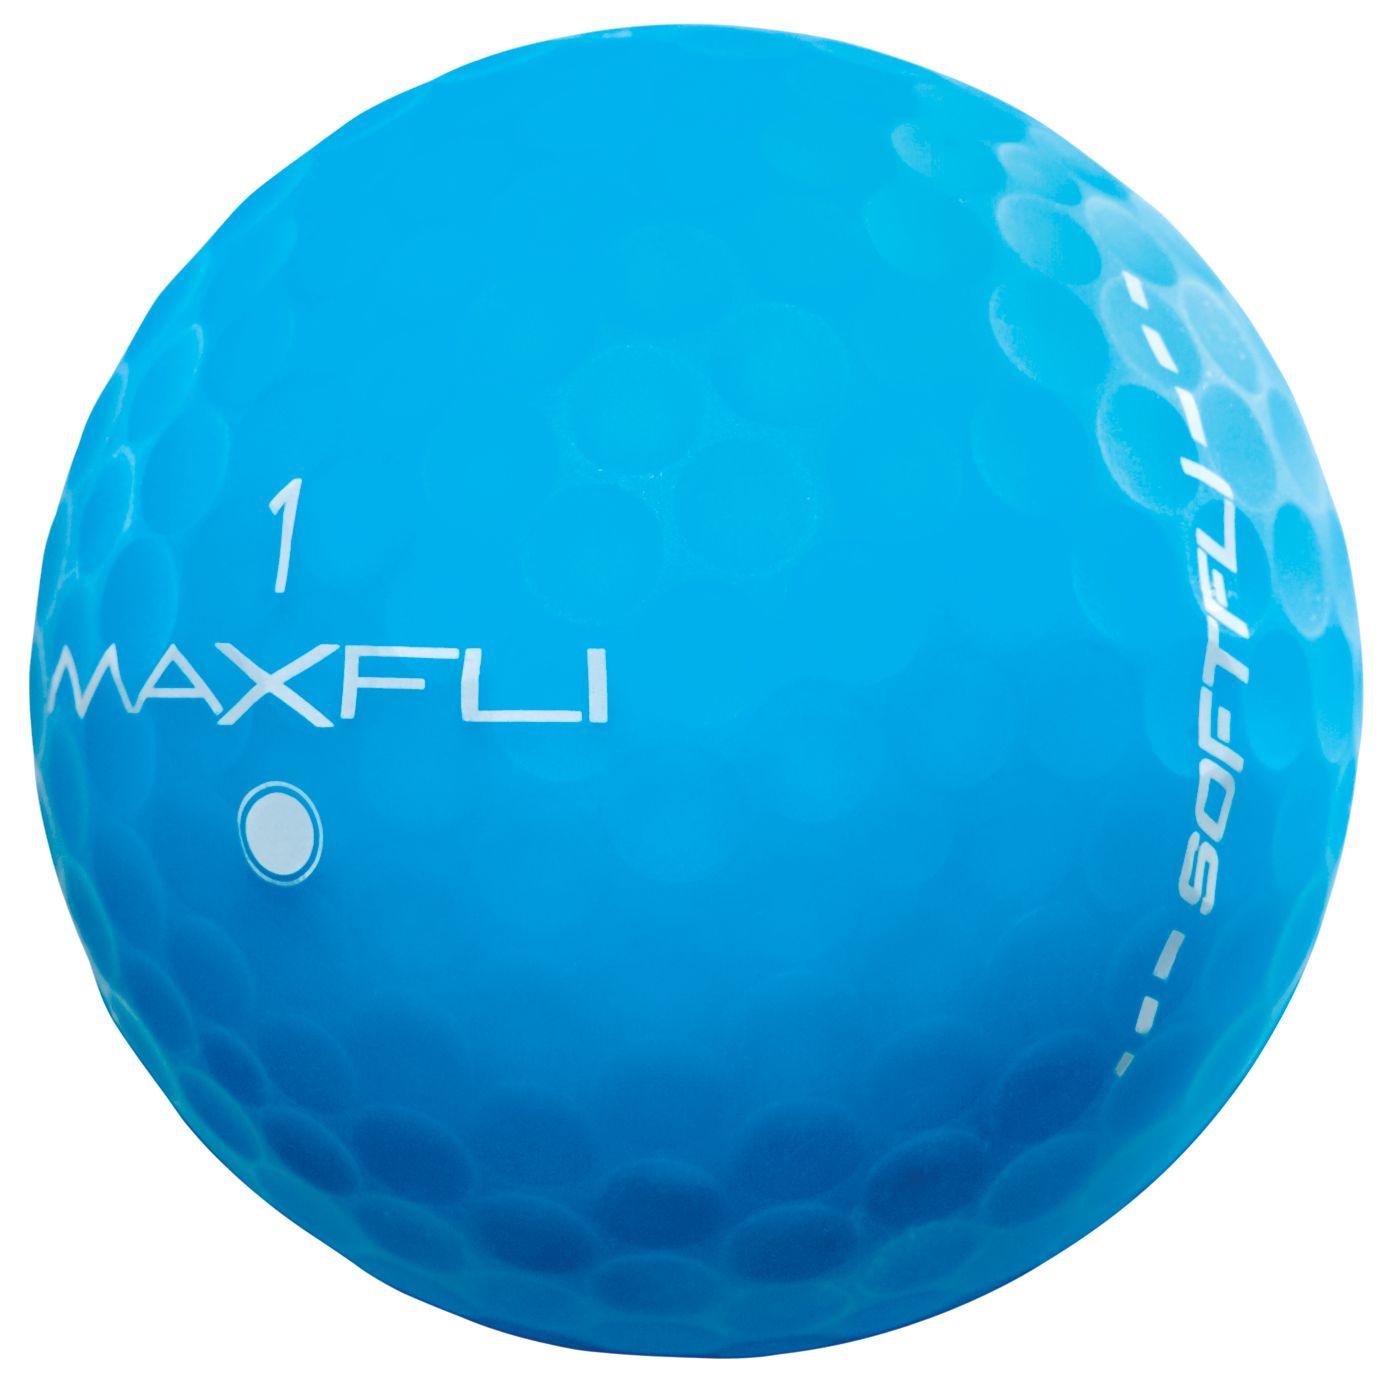 Maxfli SoftFli Matte Personalized Golf Balls – Blue